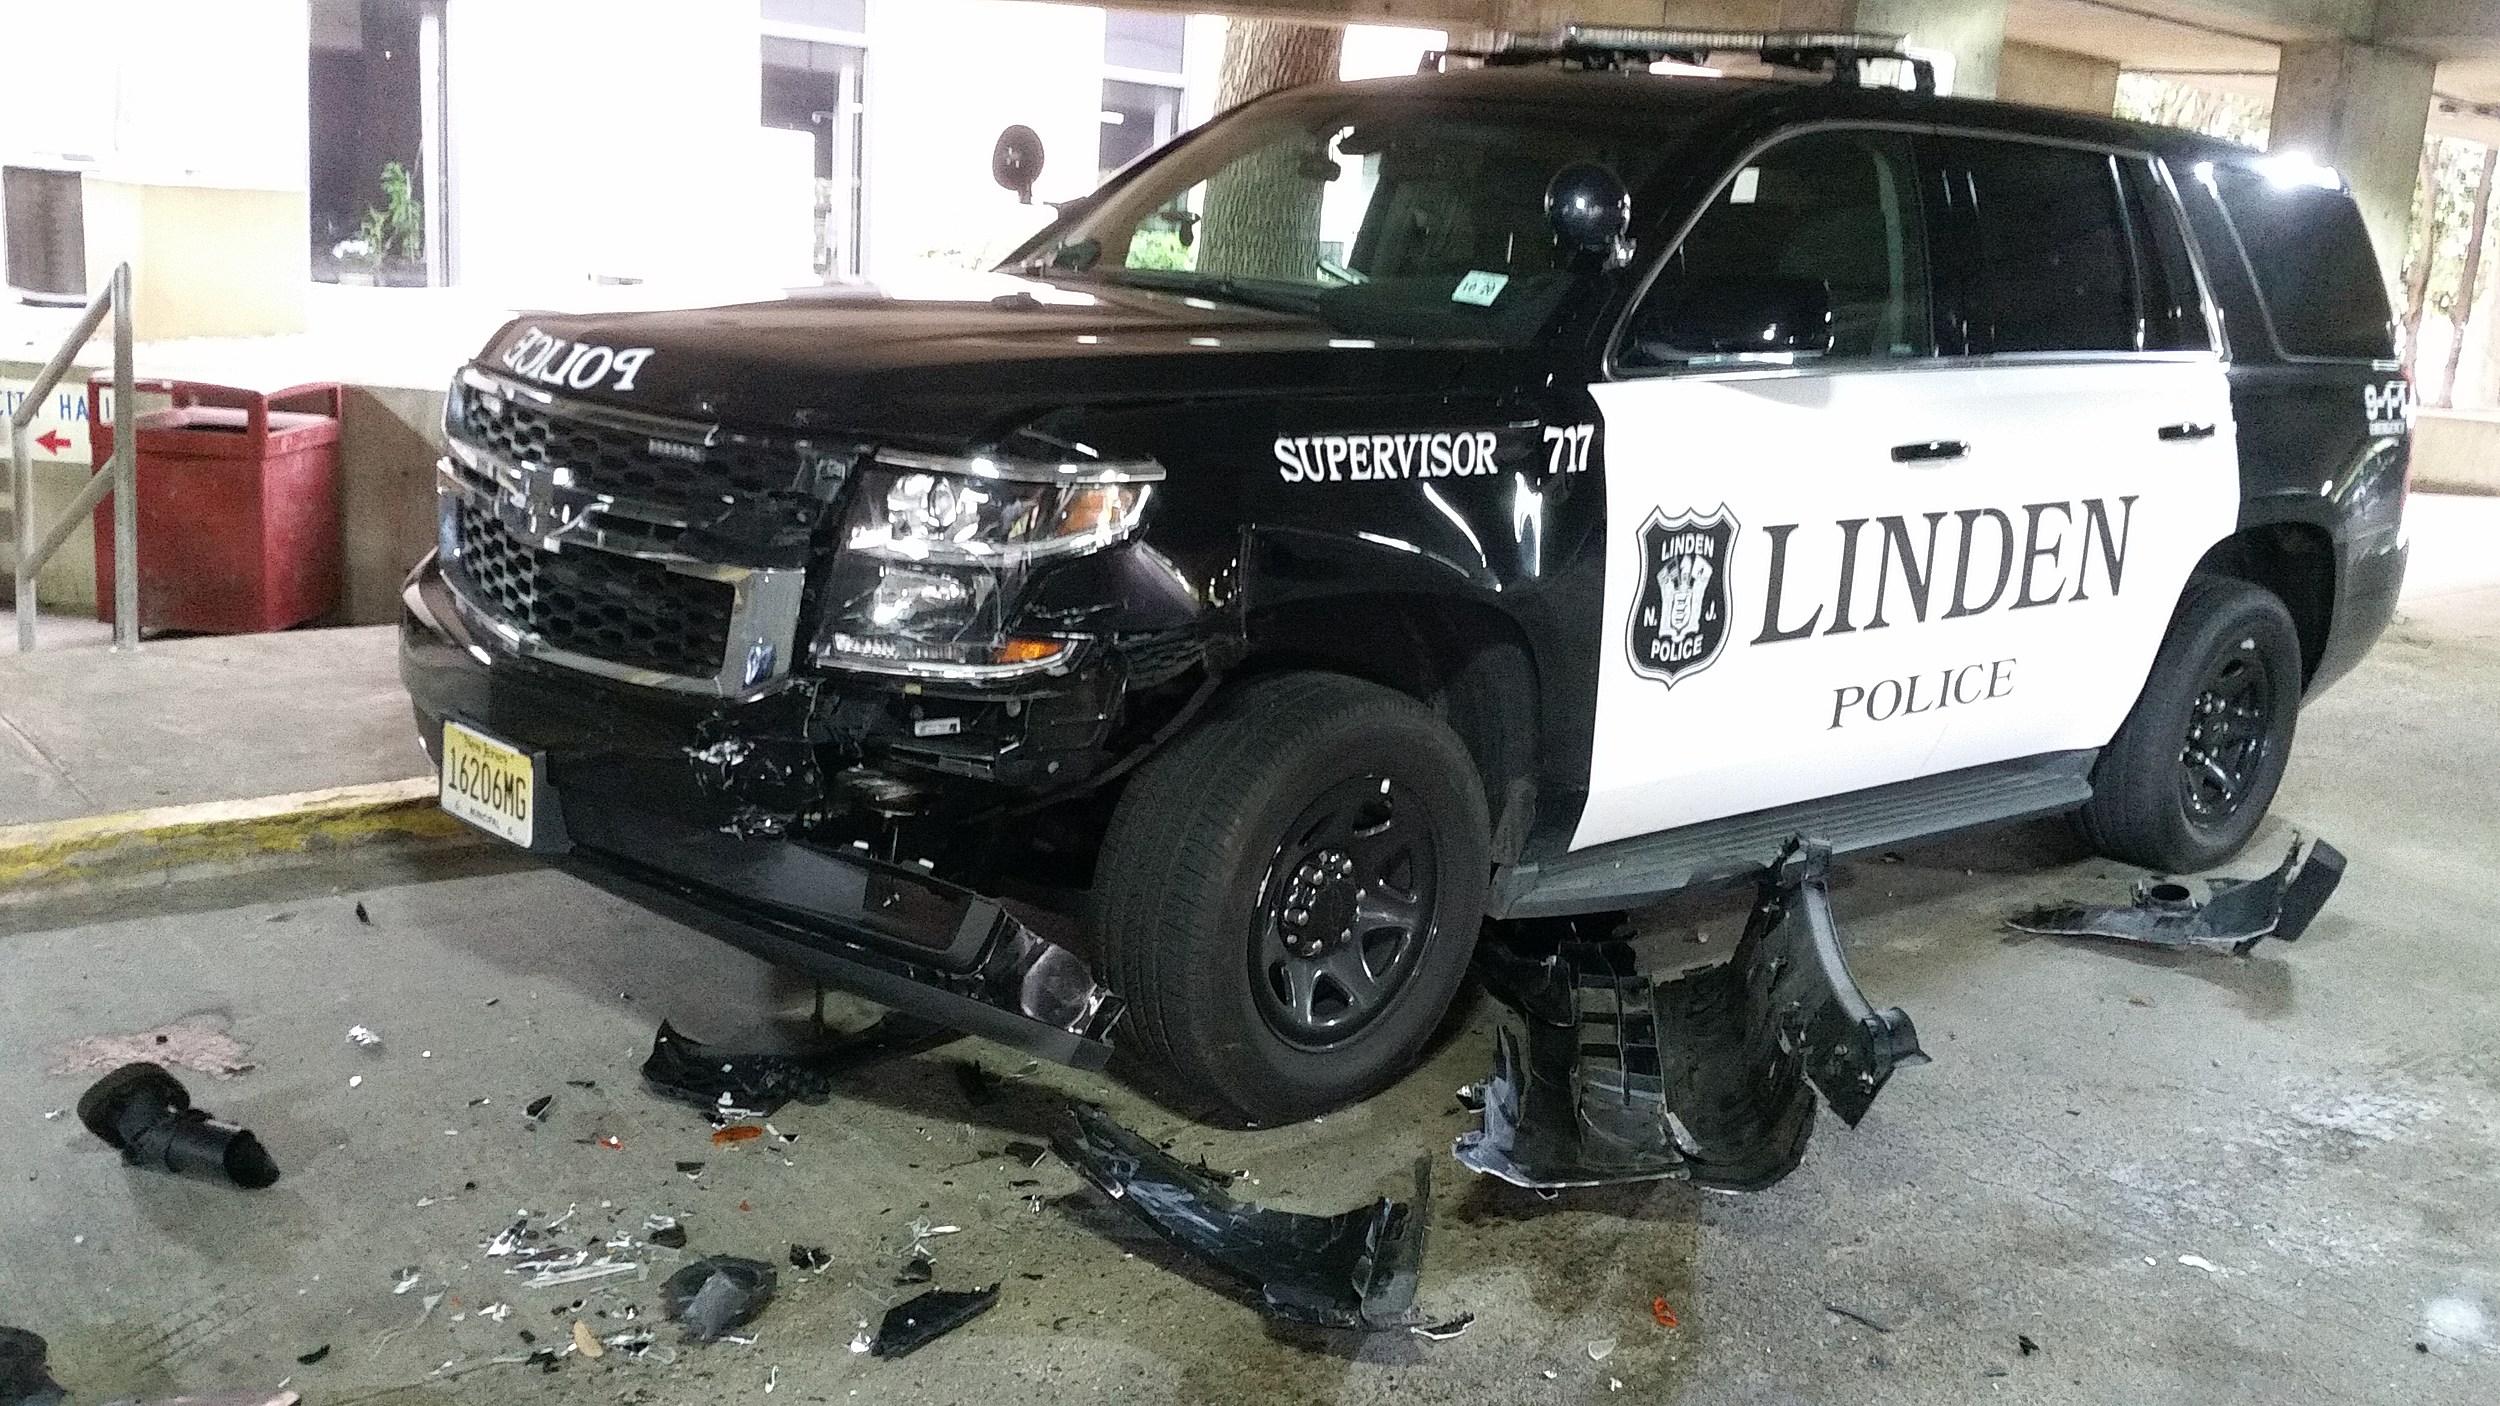 ex linden man rammed cops cars hard sprayed officers mace ex linden man rammed cops cars hard sprayed officers mace cops say